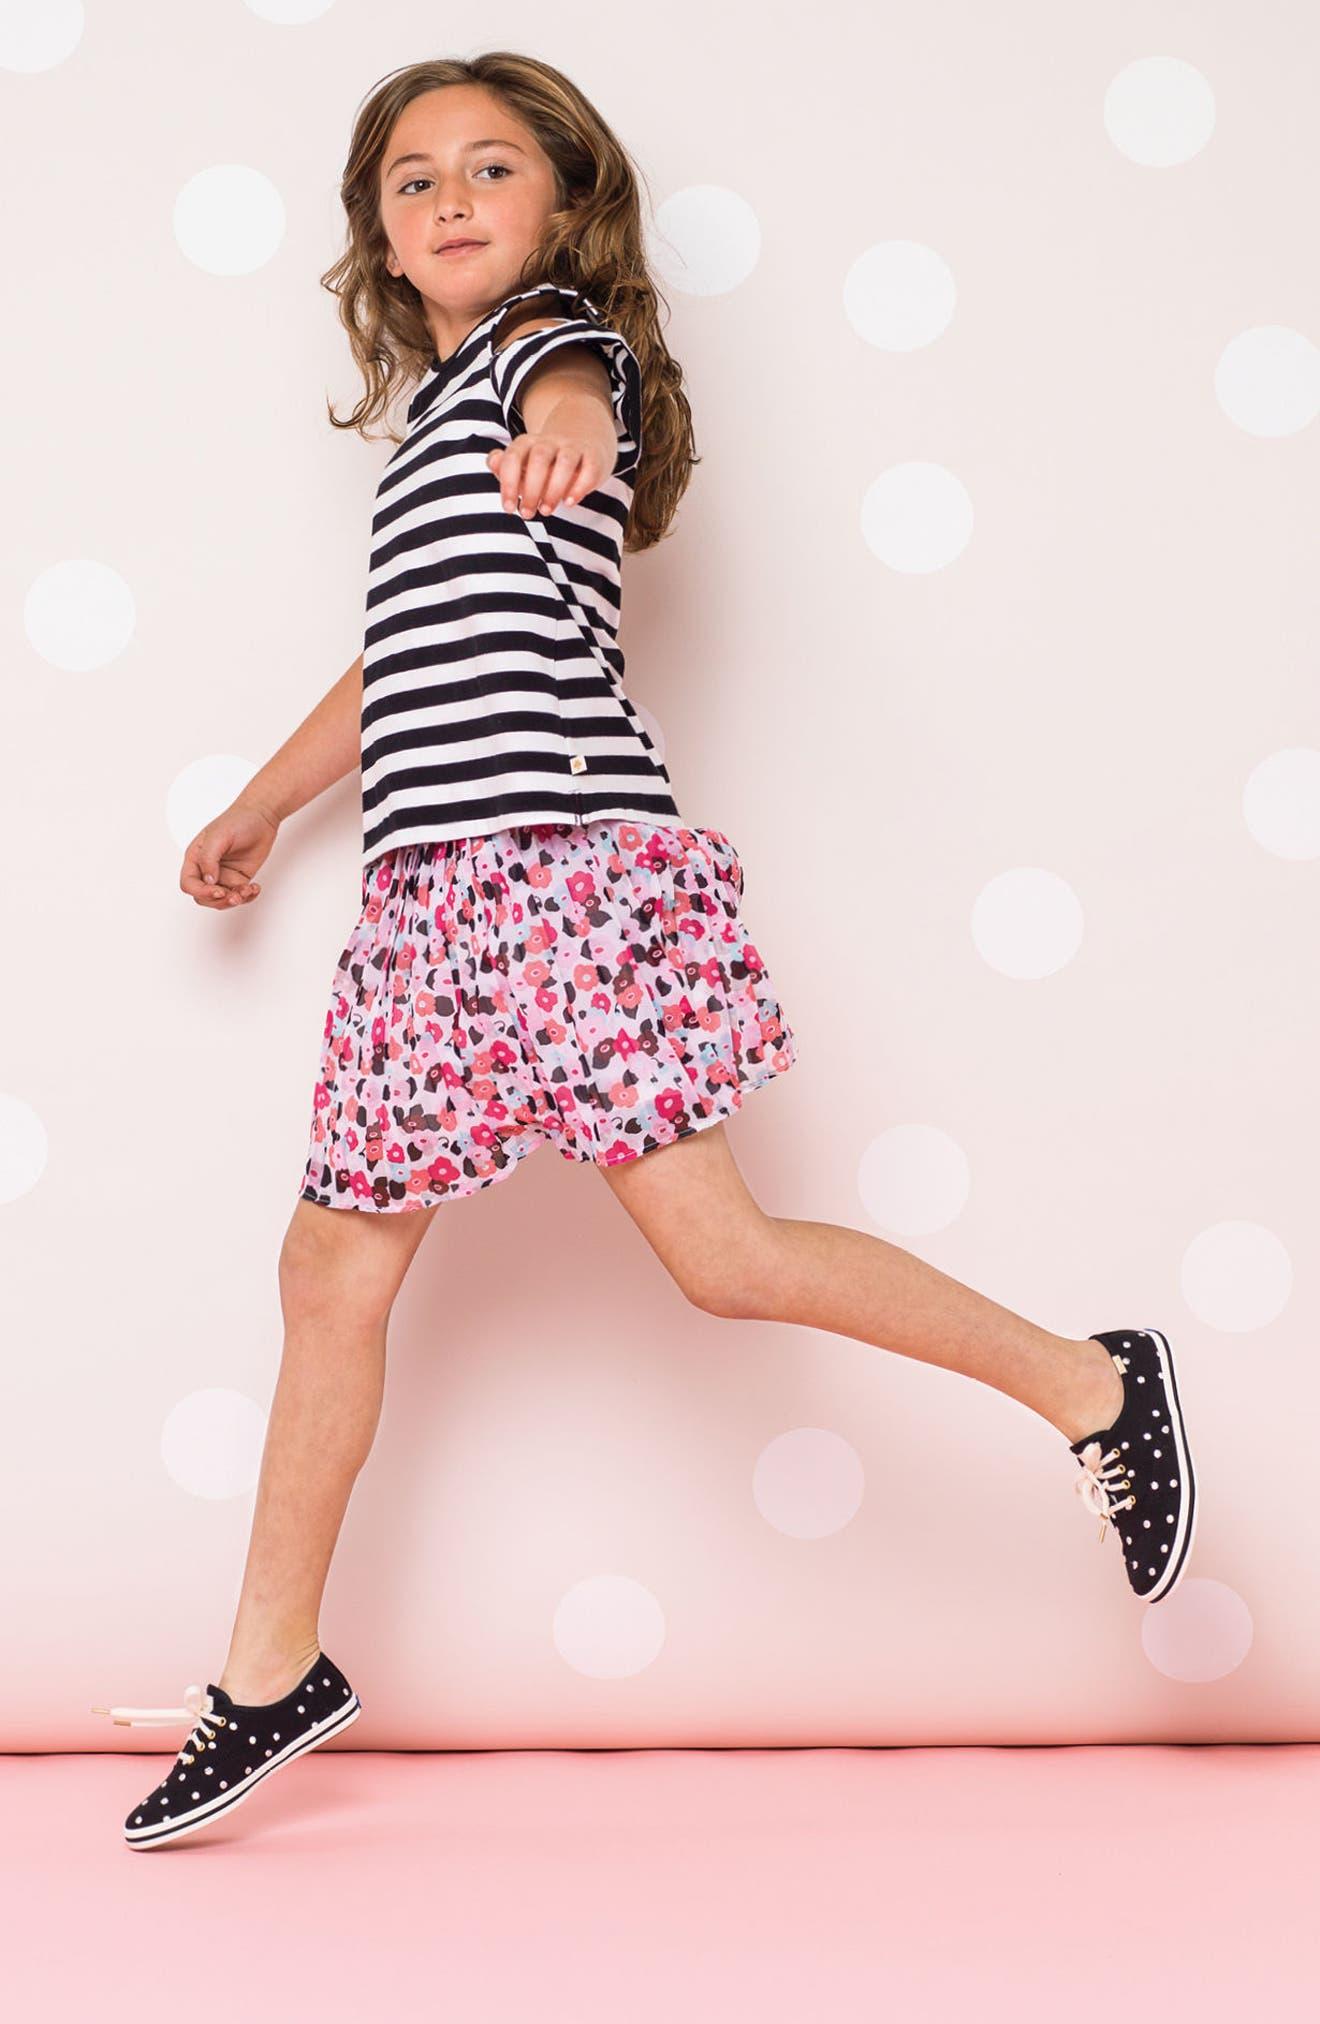 x kate spade new york champion polka dot lace-up shoe,                             Alternate thumbnail 7, color,                             BLACK DANCING DOT